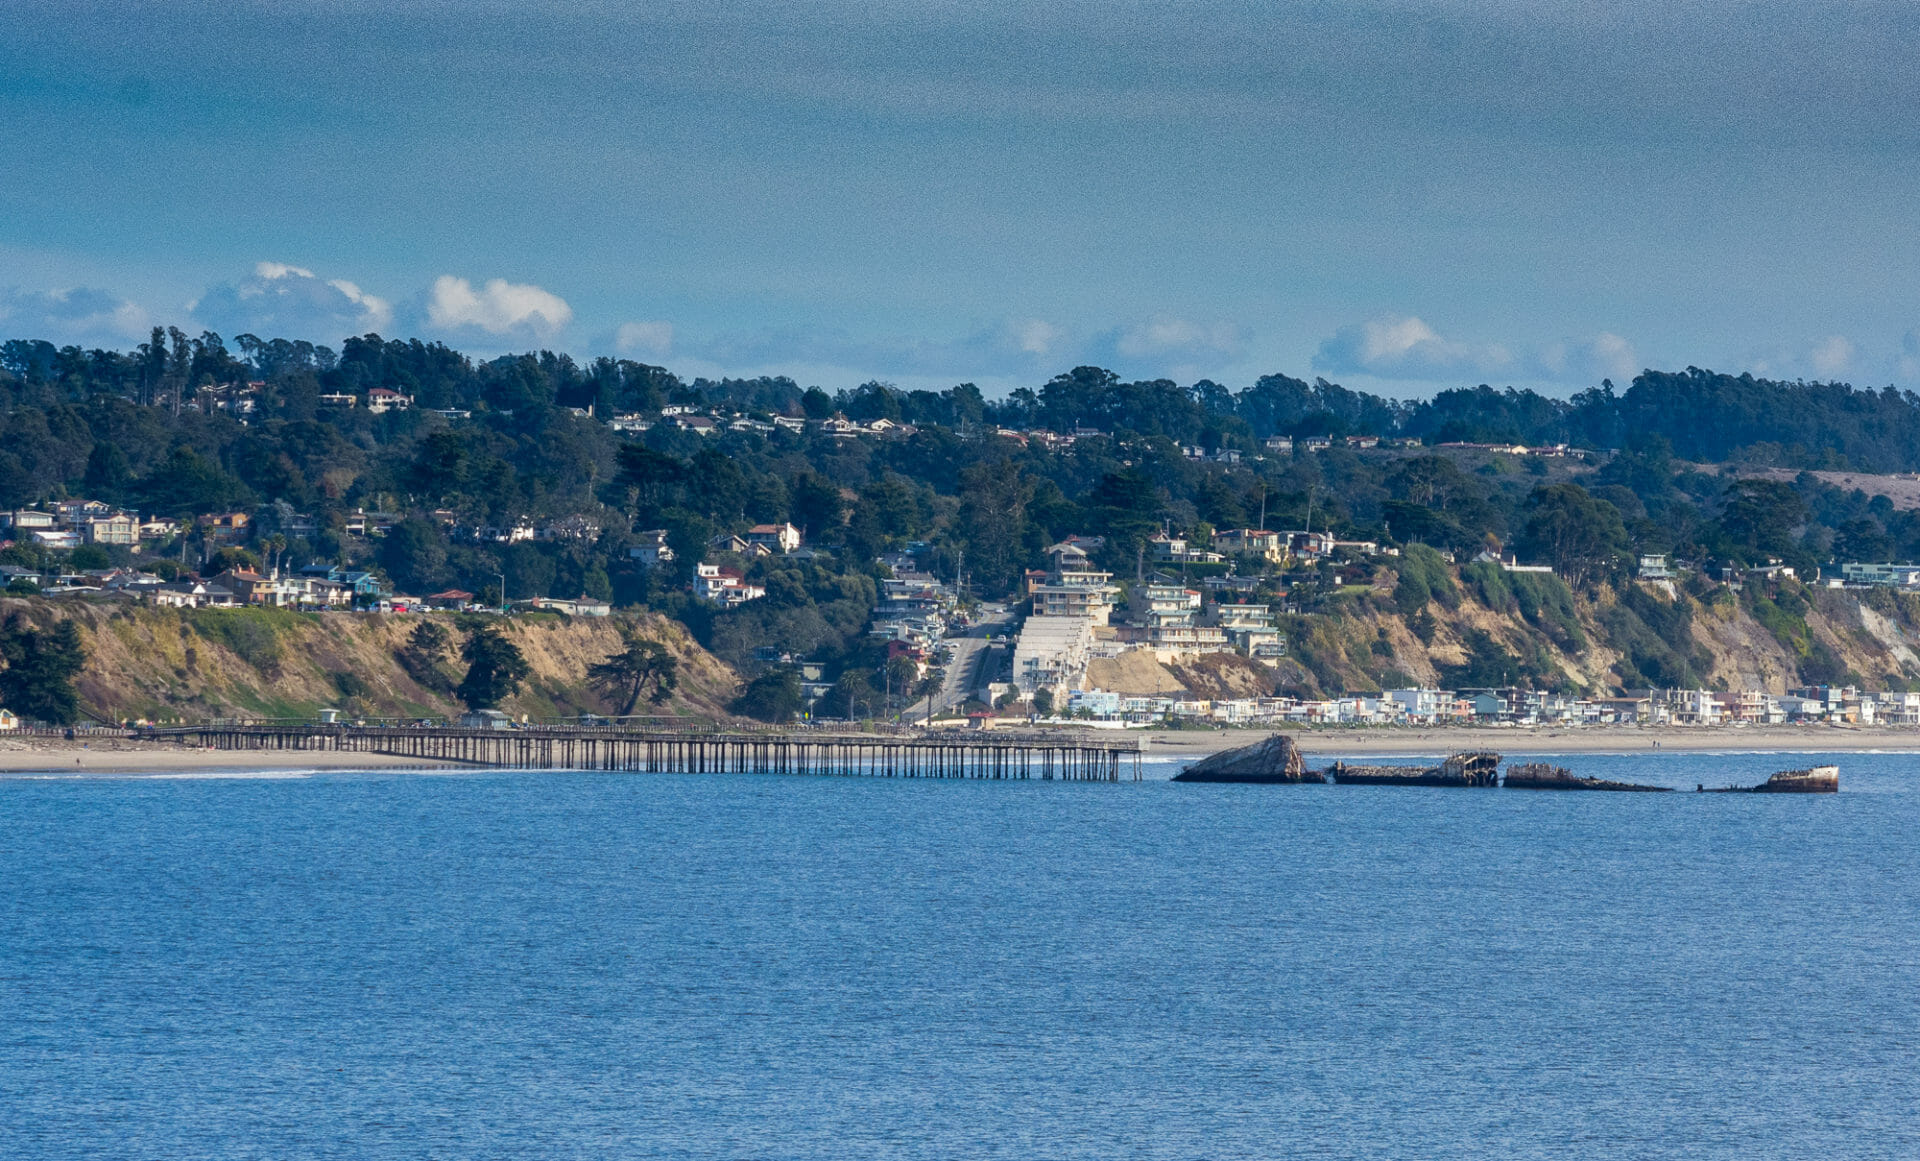 Seaside State Beach Pier goes to sunken ship